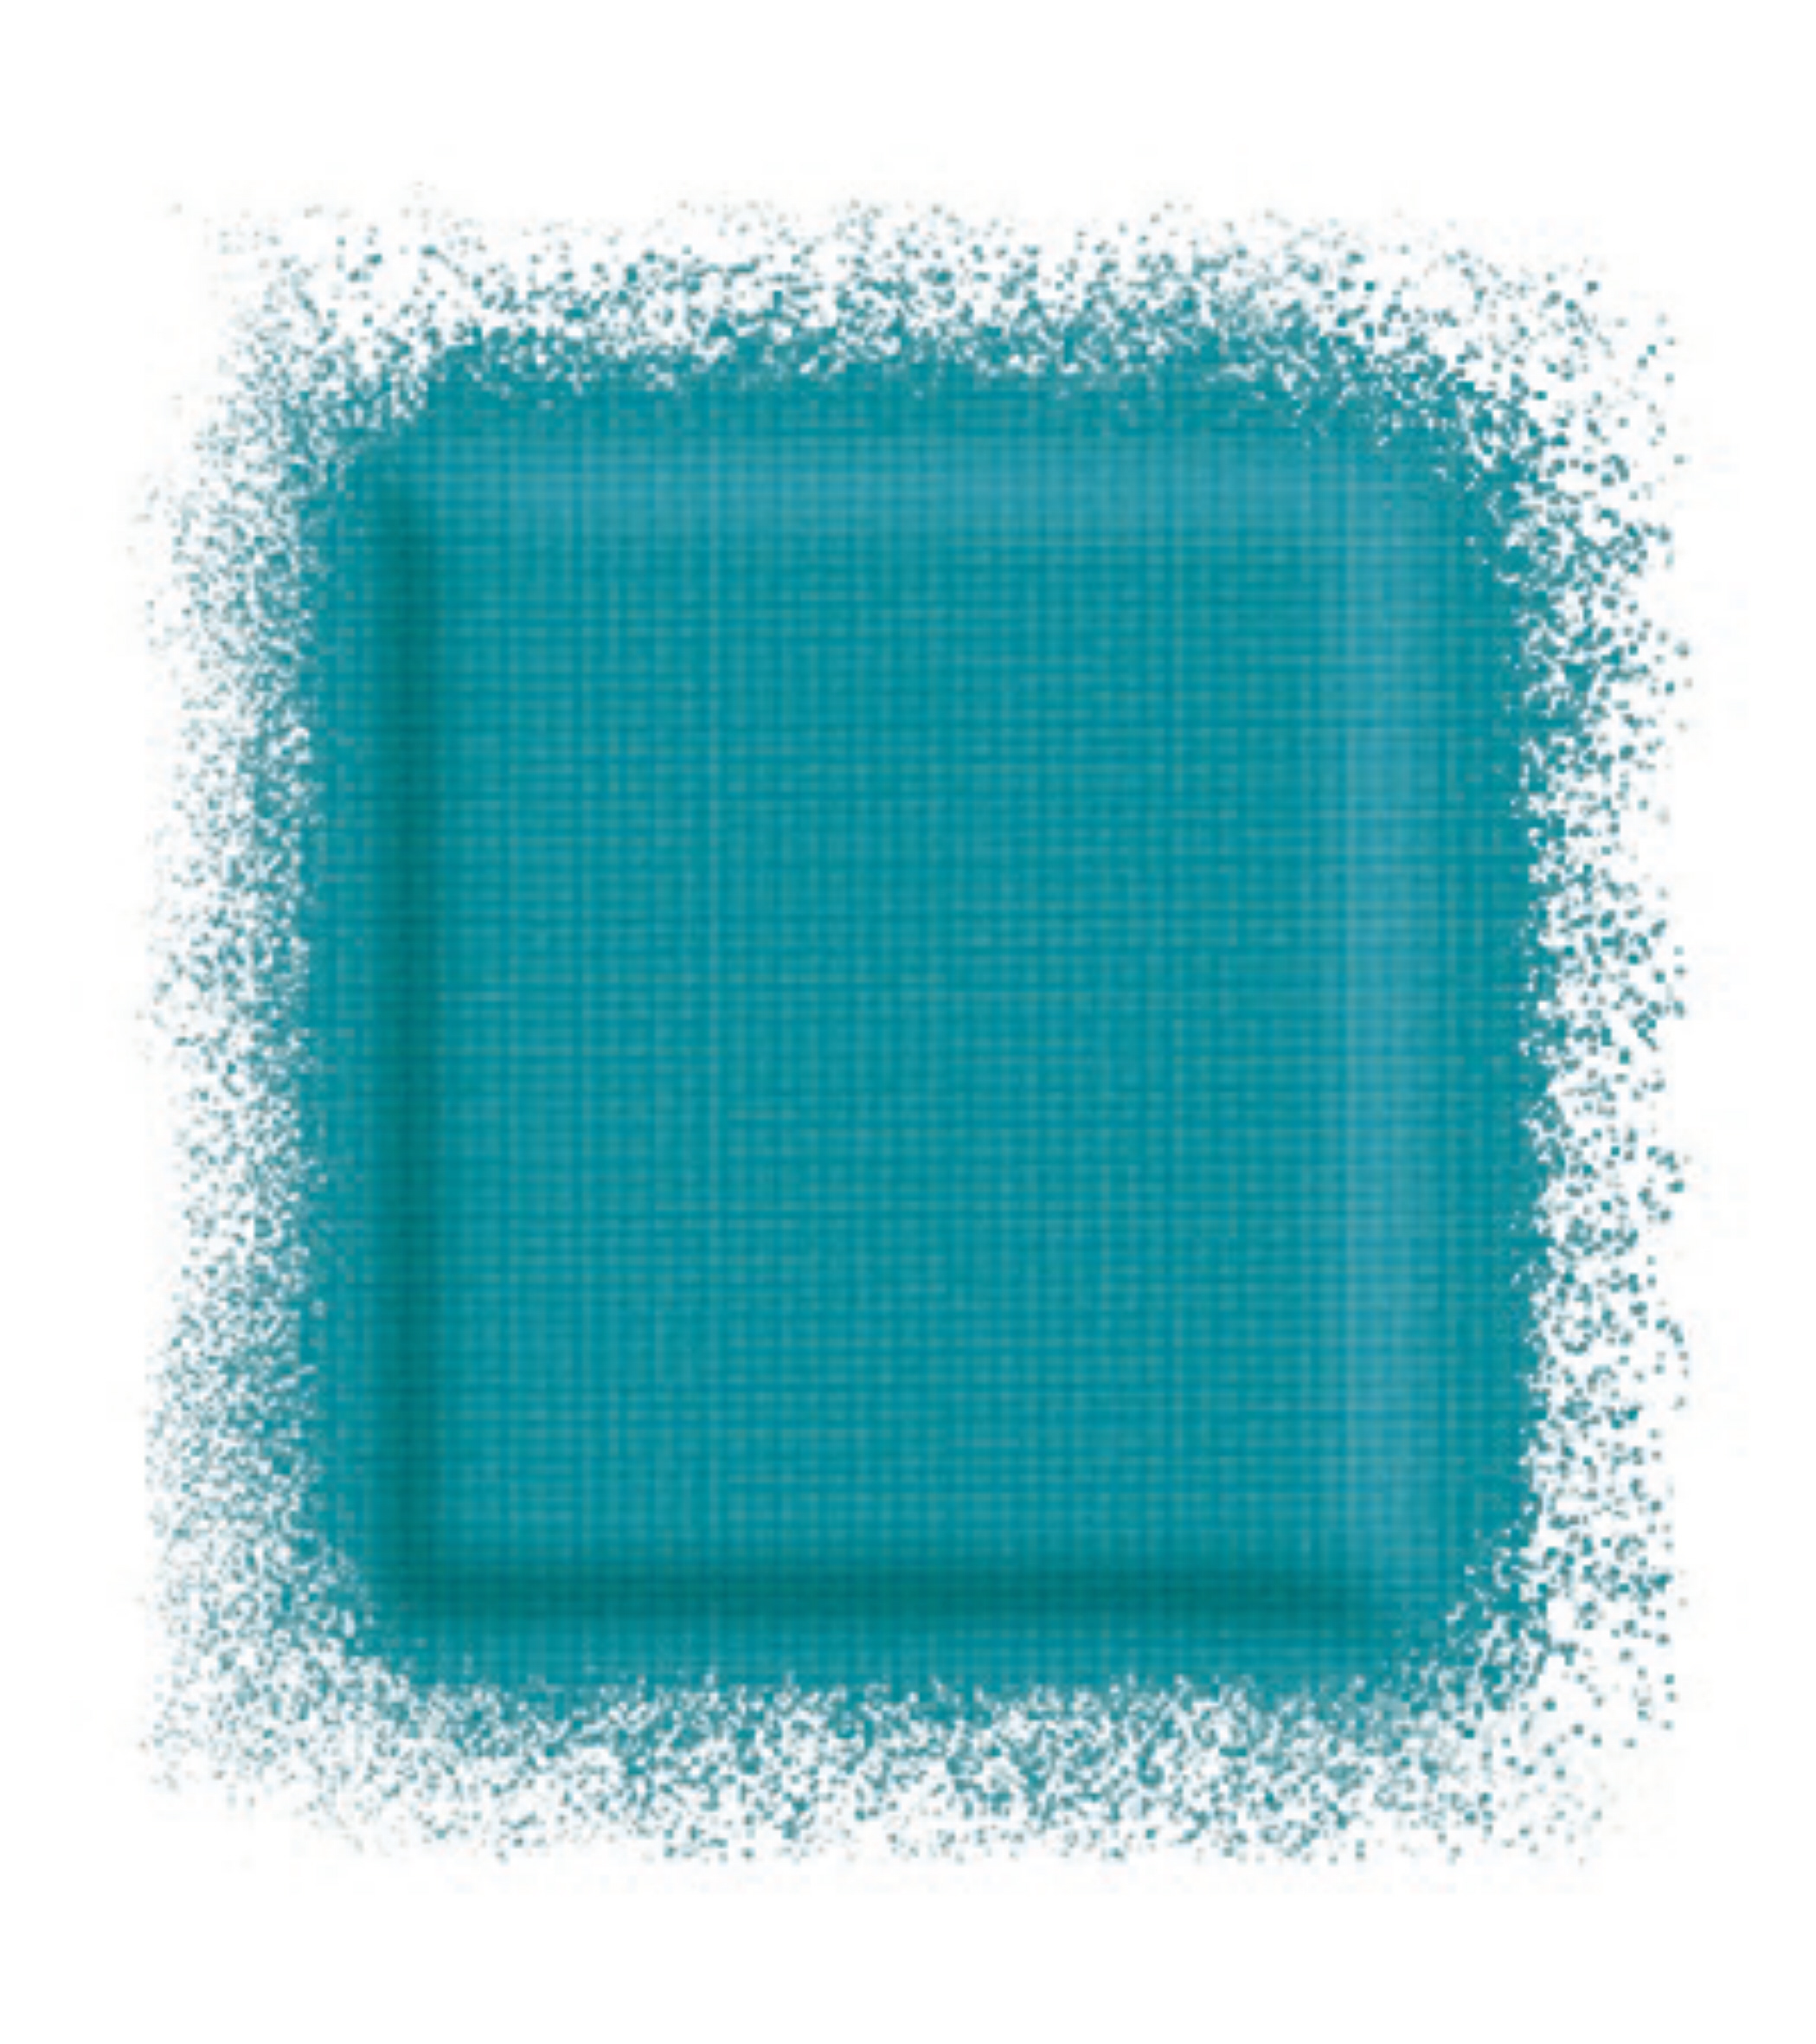 Тени для глаз Artist color shadow refill high impact eye shadow 2,5 г (M-234 Бирюзовый) Make Up For Ever